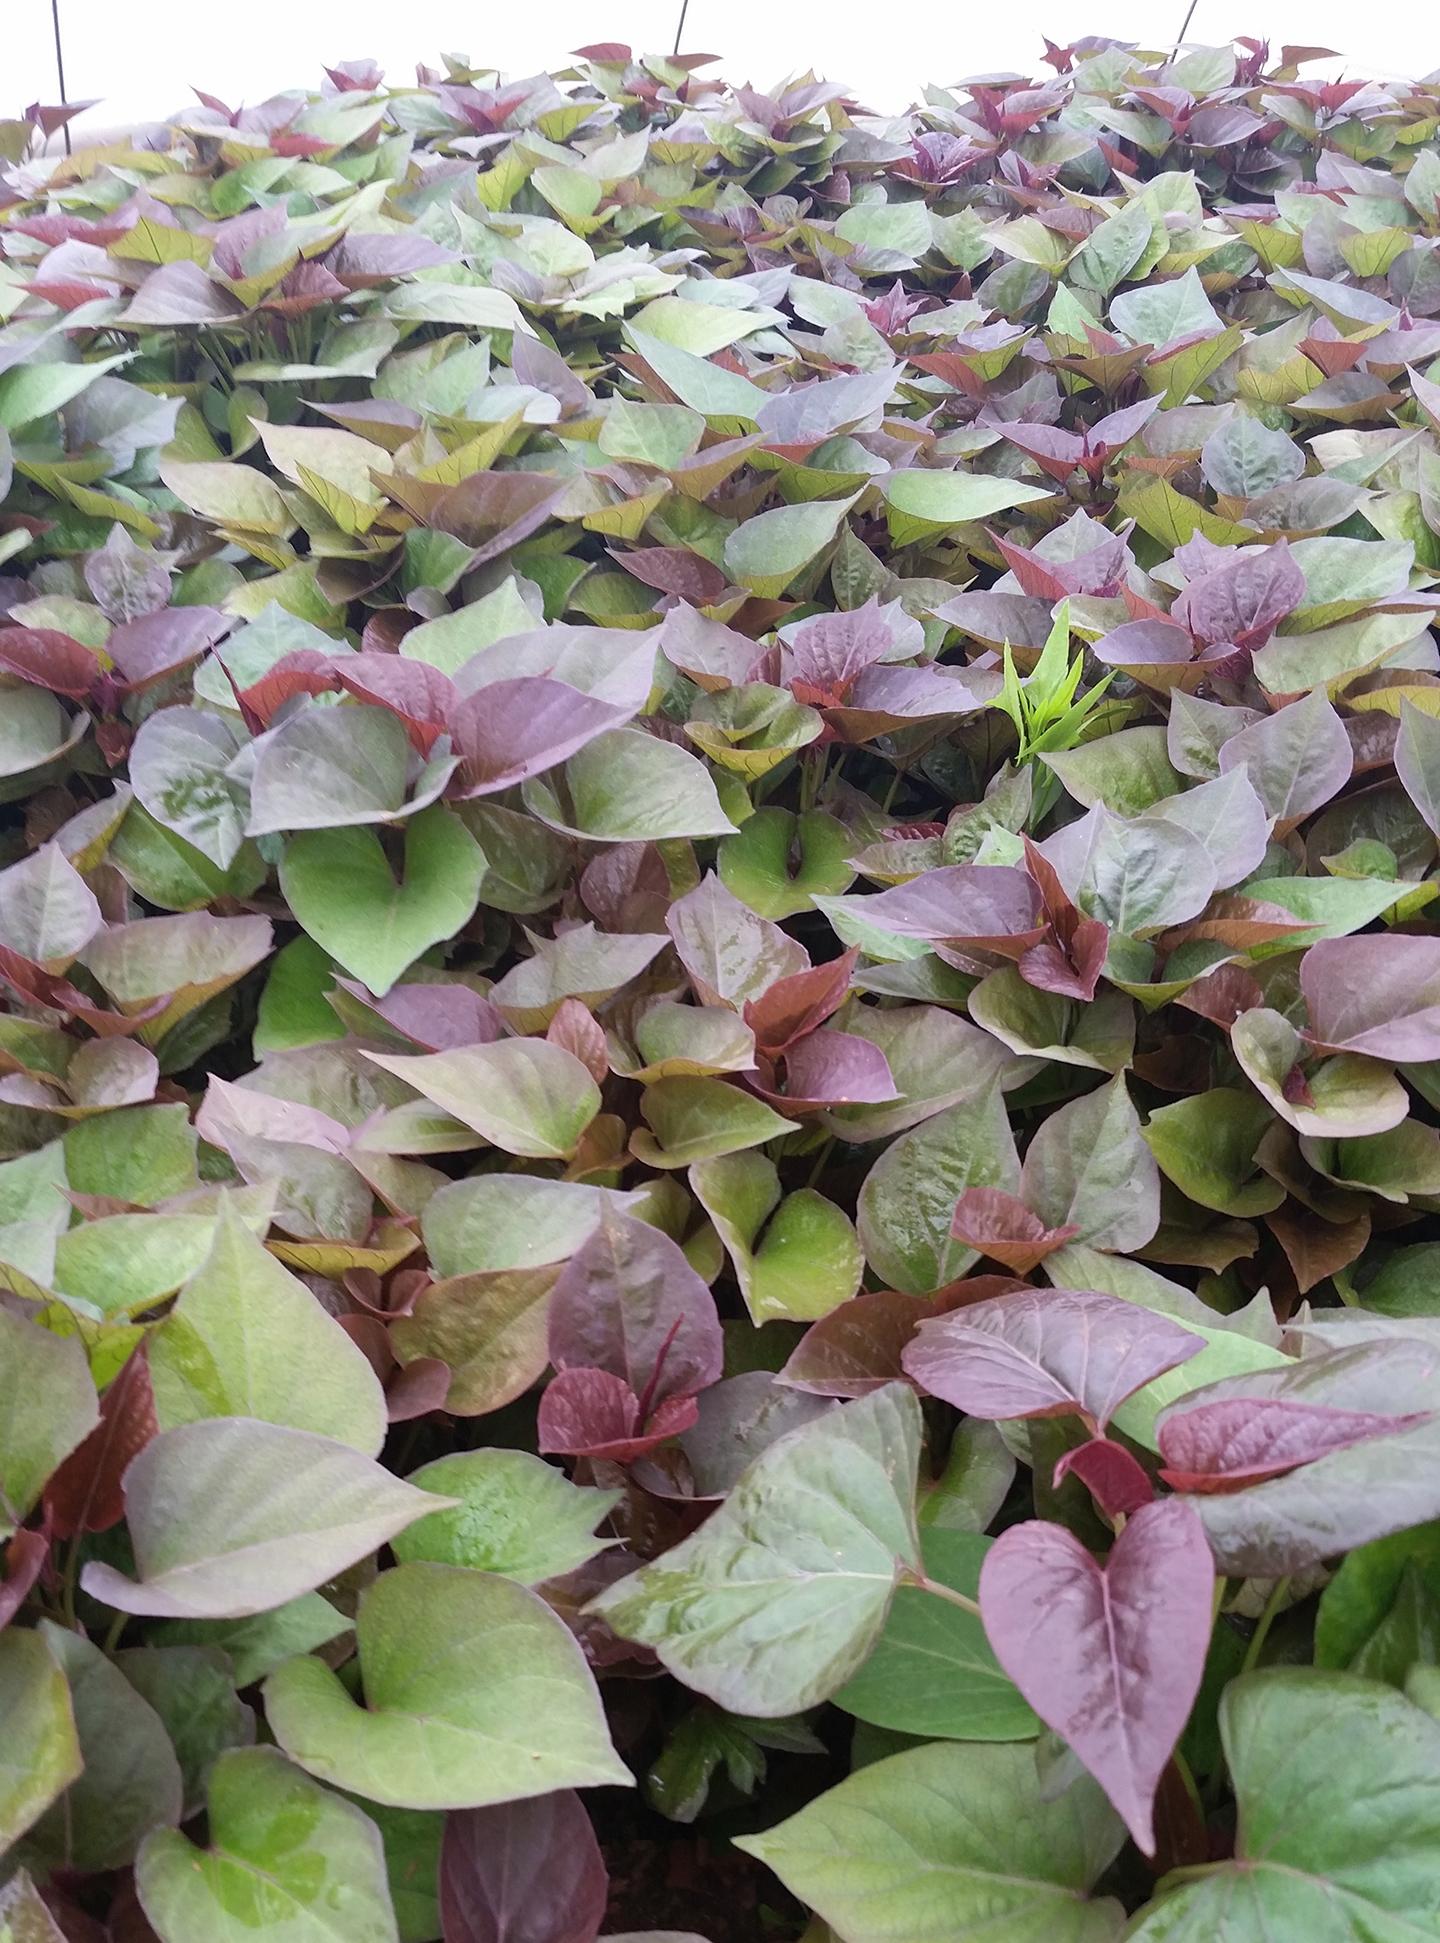 Korea Trip - Sweet Potato Plants